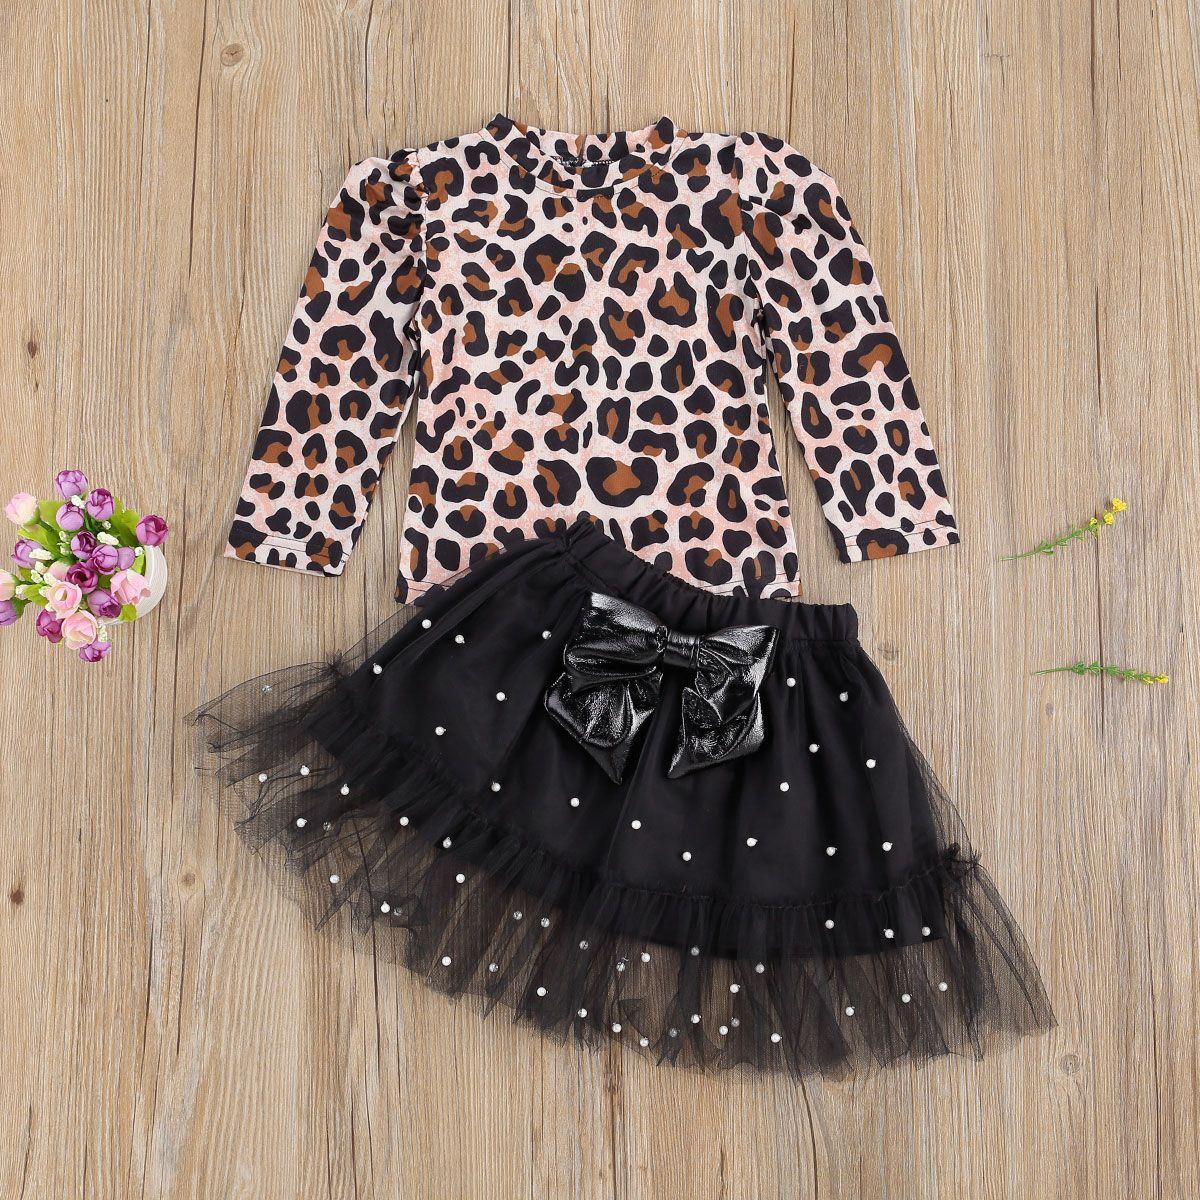 Herbst Mode Kinder Mädchen Leopard Kleidung Sets 2 stücke Langarm Pullover T Shirts Tops Pearl Spitze Bogen Tutu Röcke 1-6t